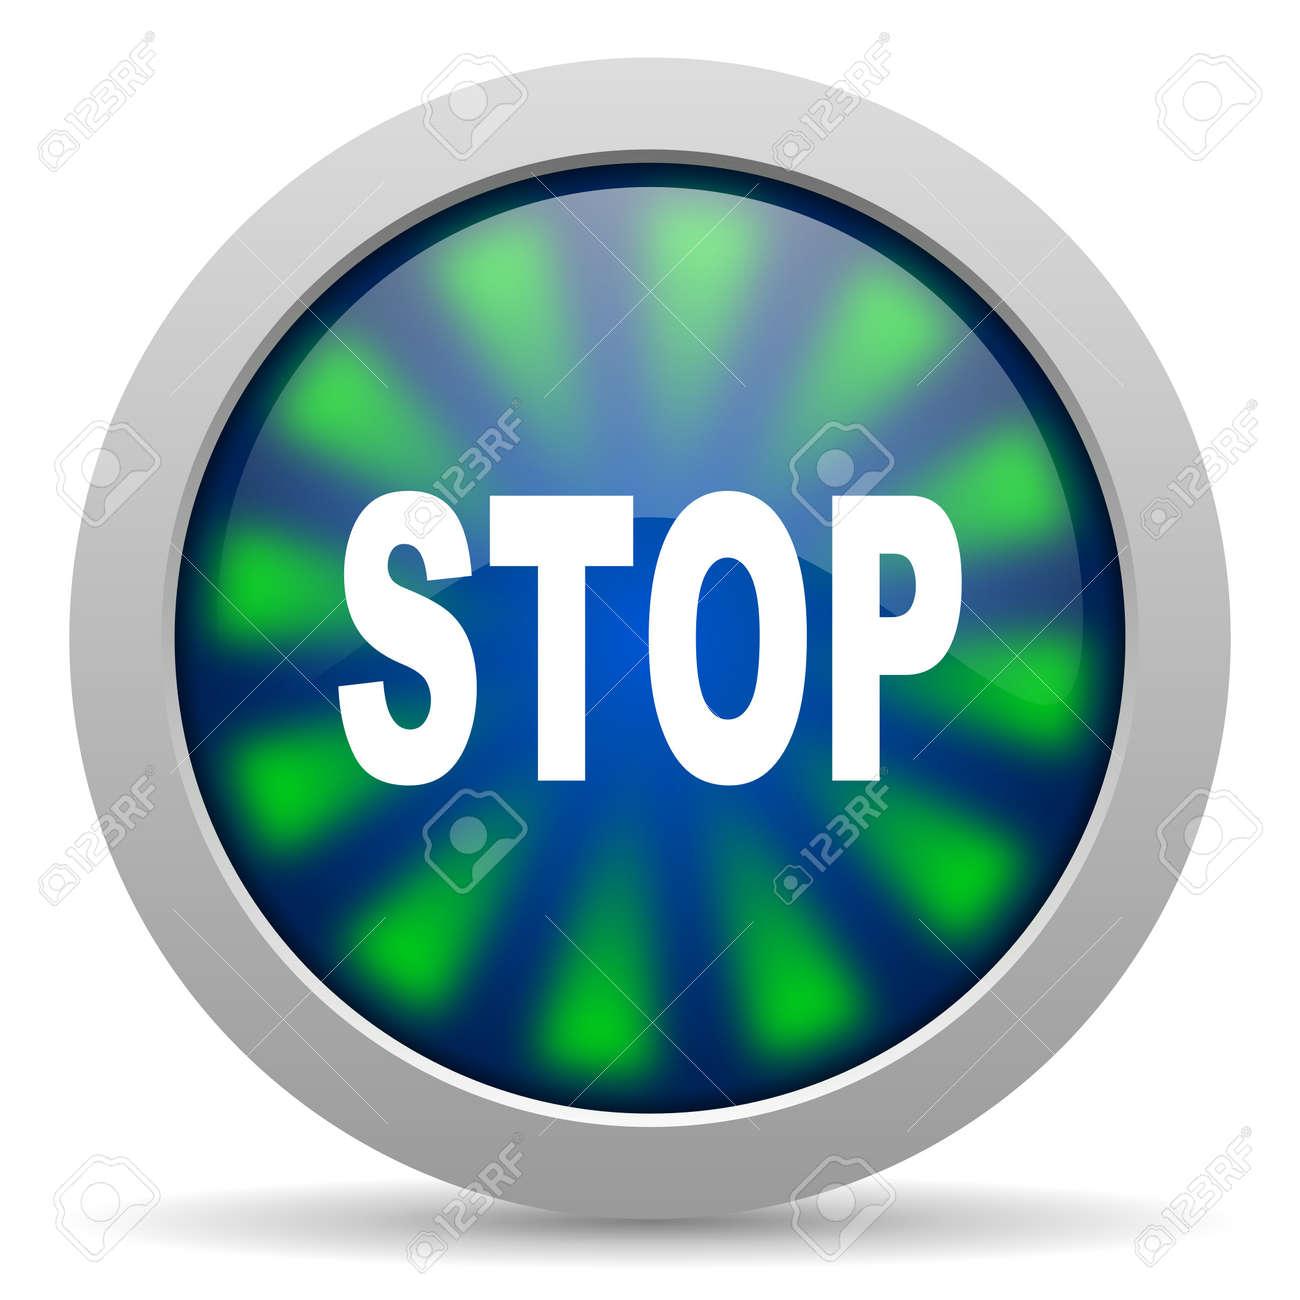 stop icon Stock Photo - 20223752